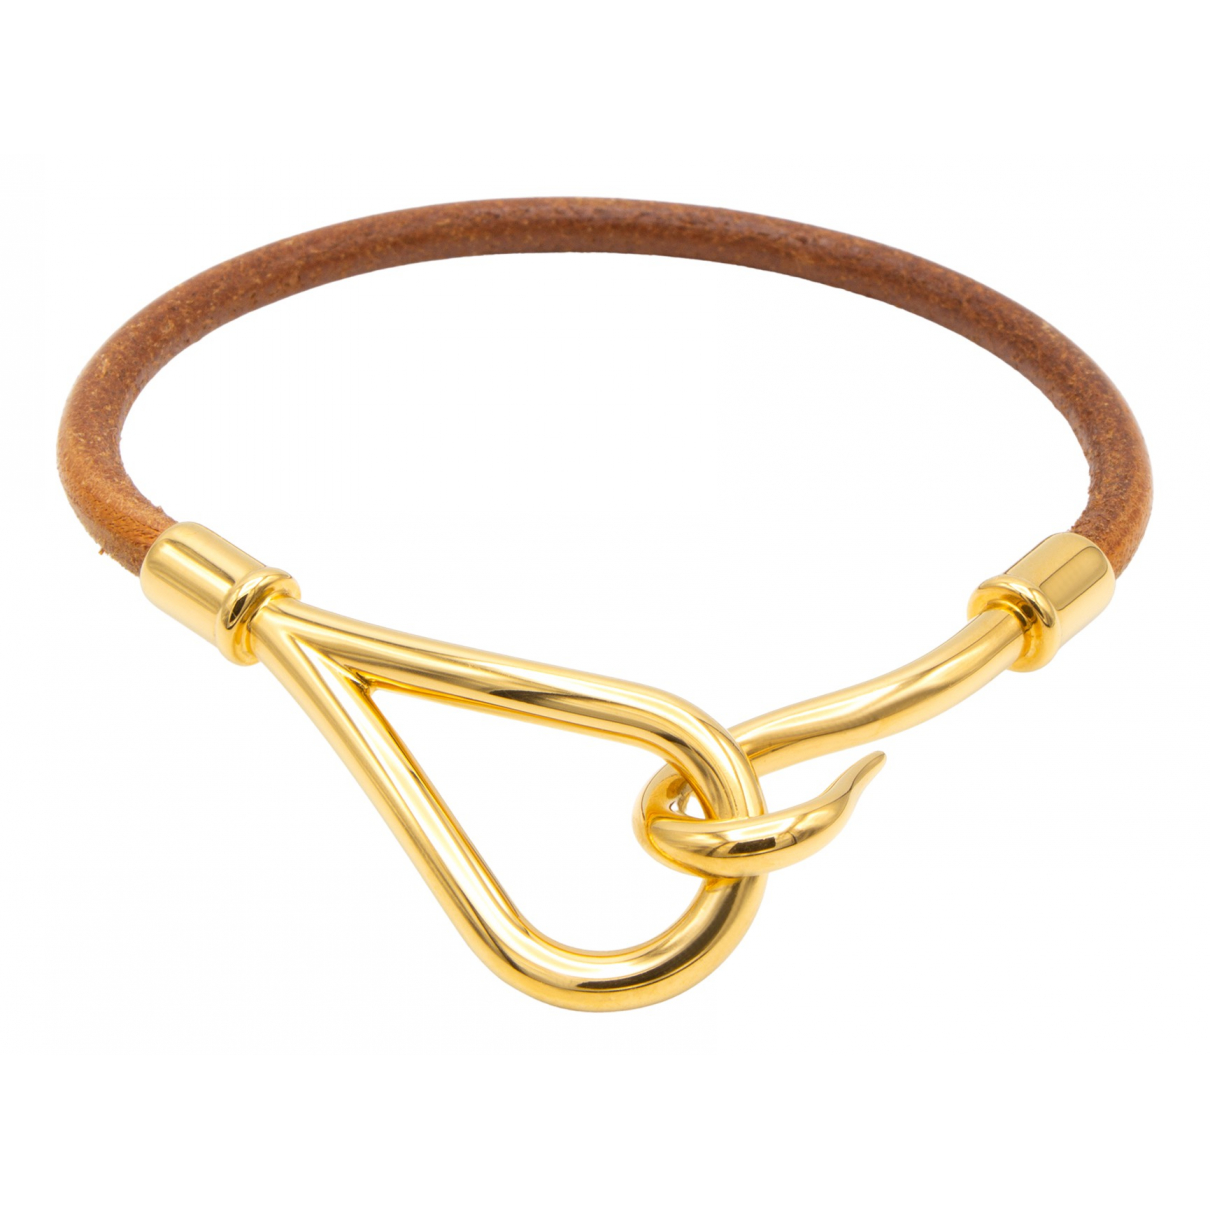 Hermes - Bracelet Jumbo pour femme en cuir - dore